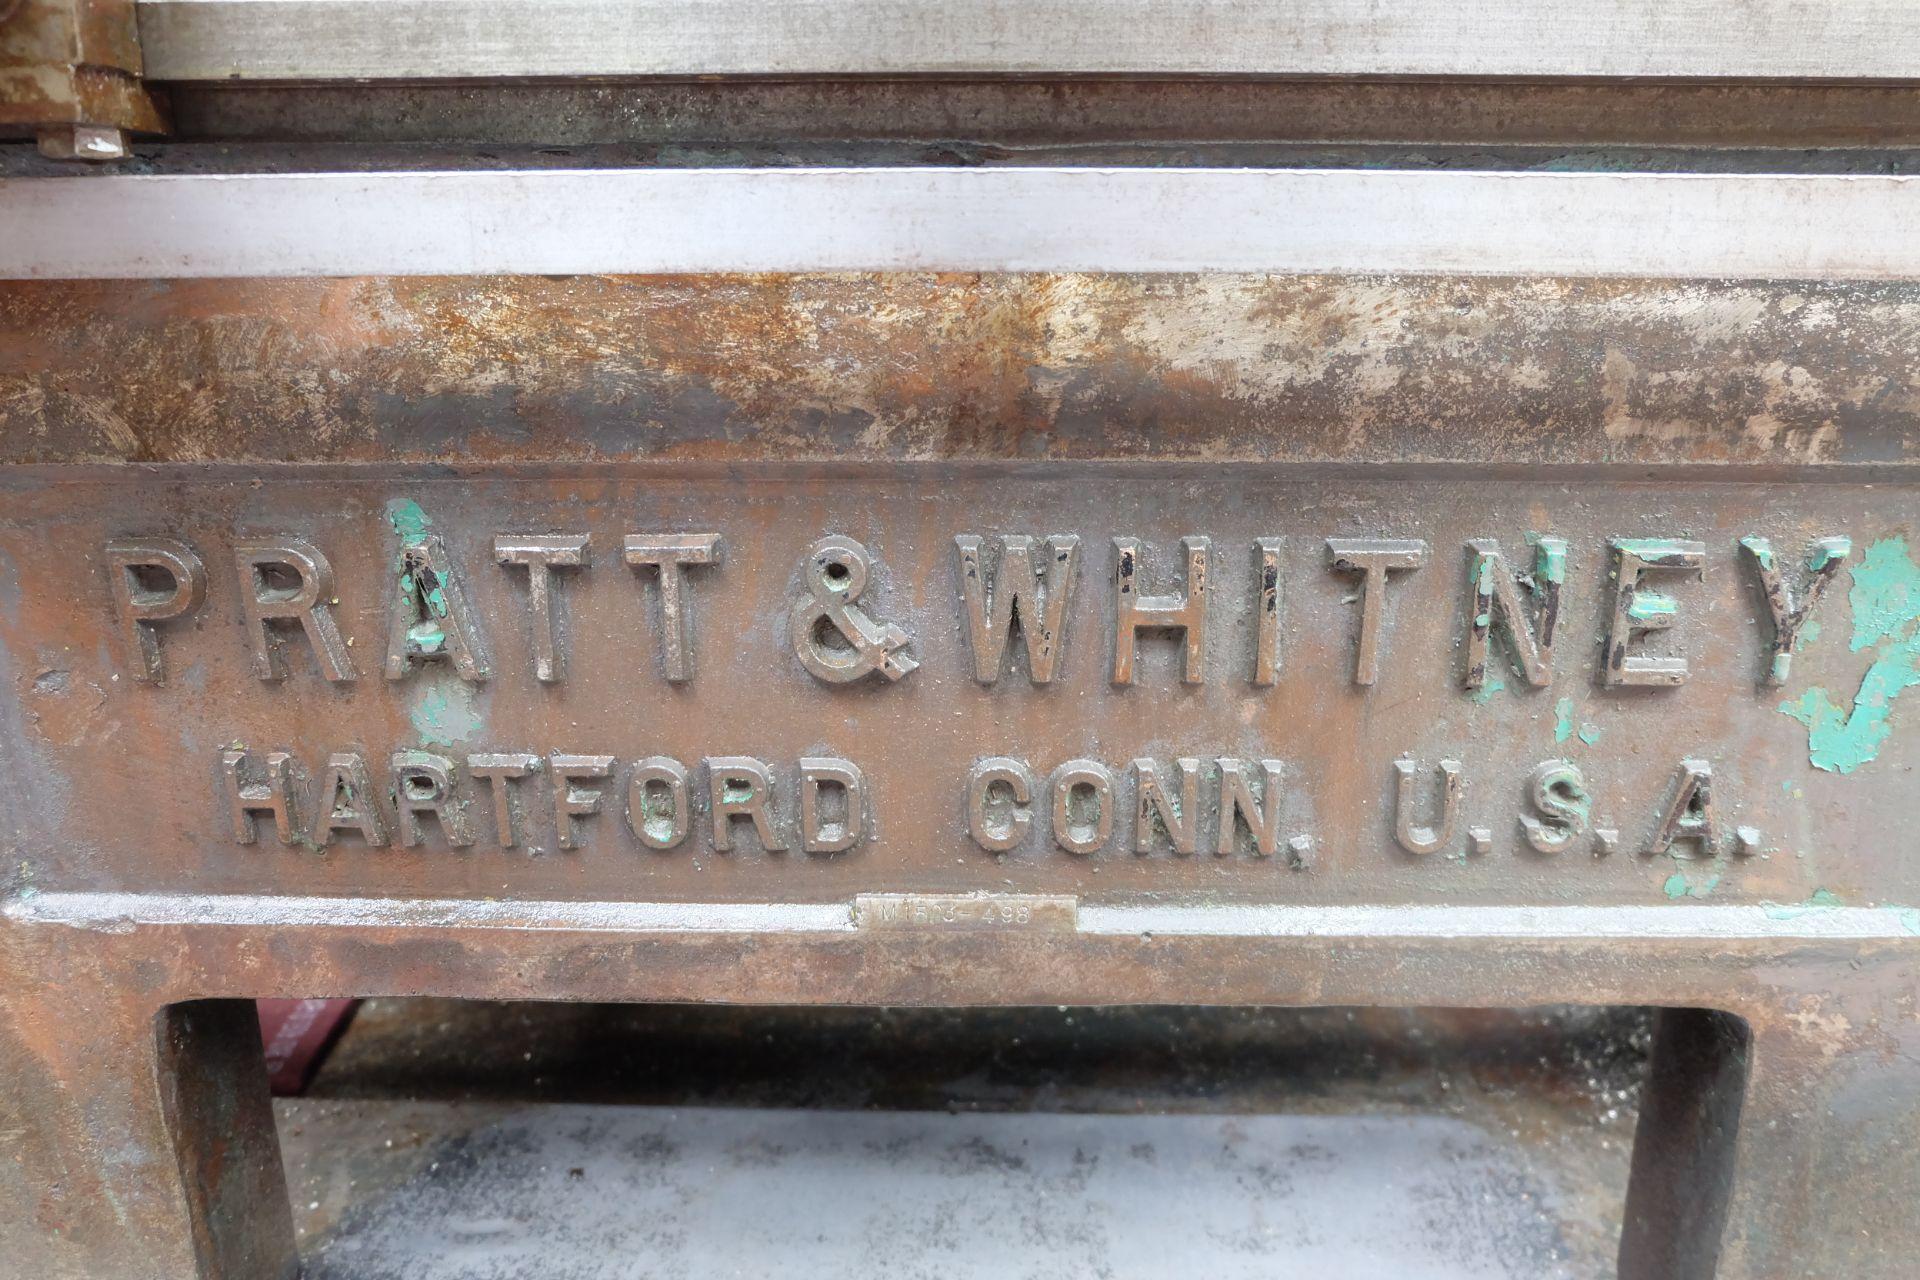 "Pratt & Whitney Model C-M1503 6"" Thread Milling Machine. - Image 10 of 13"